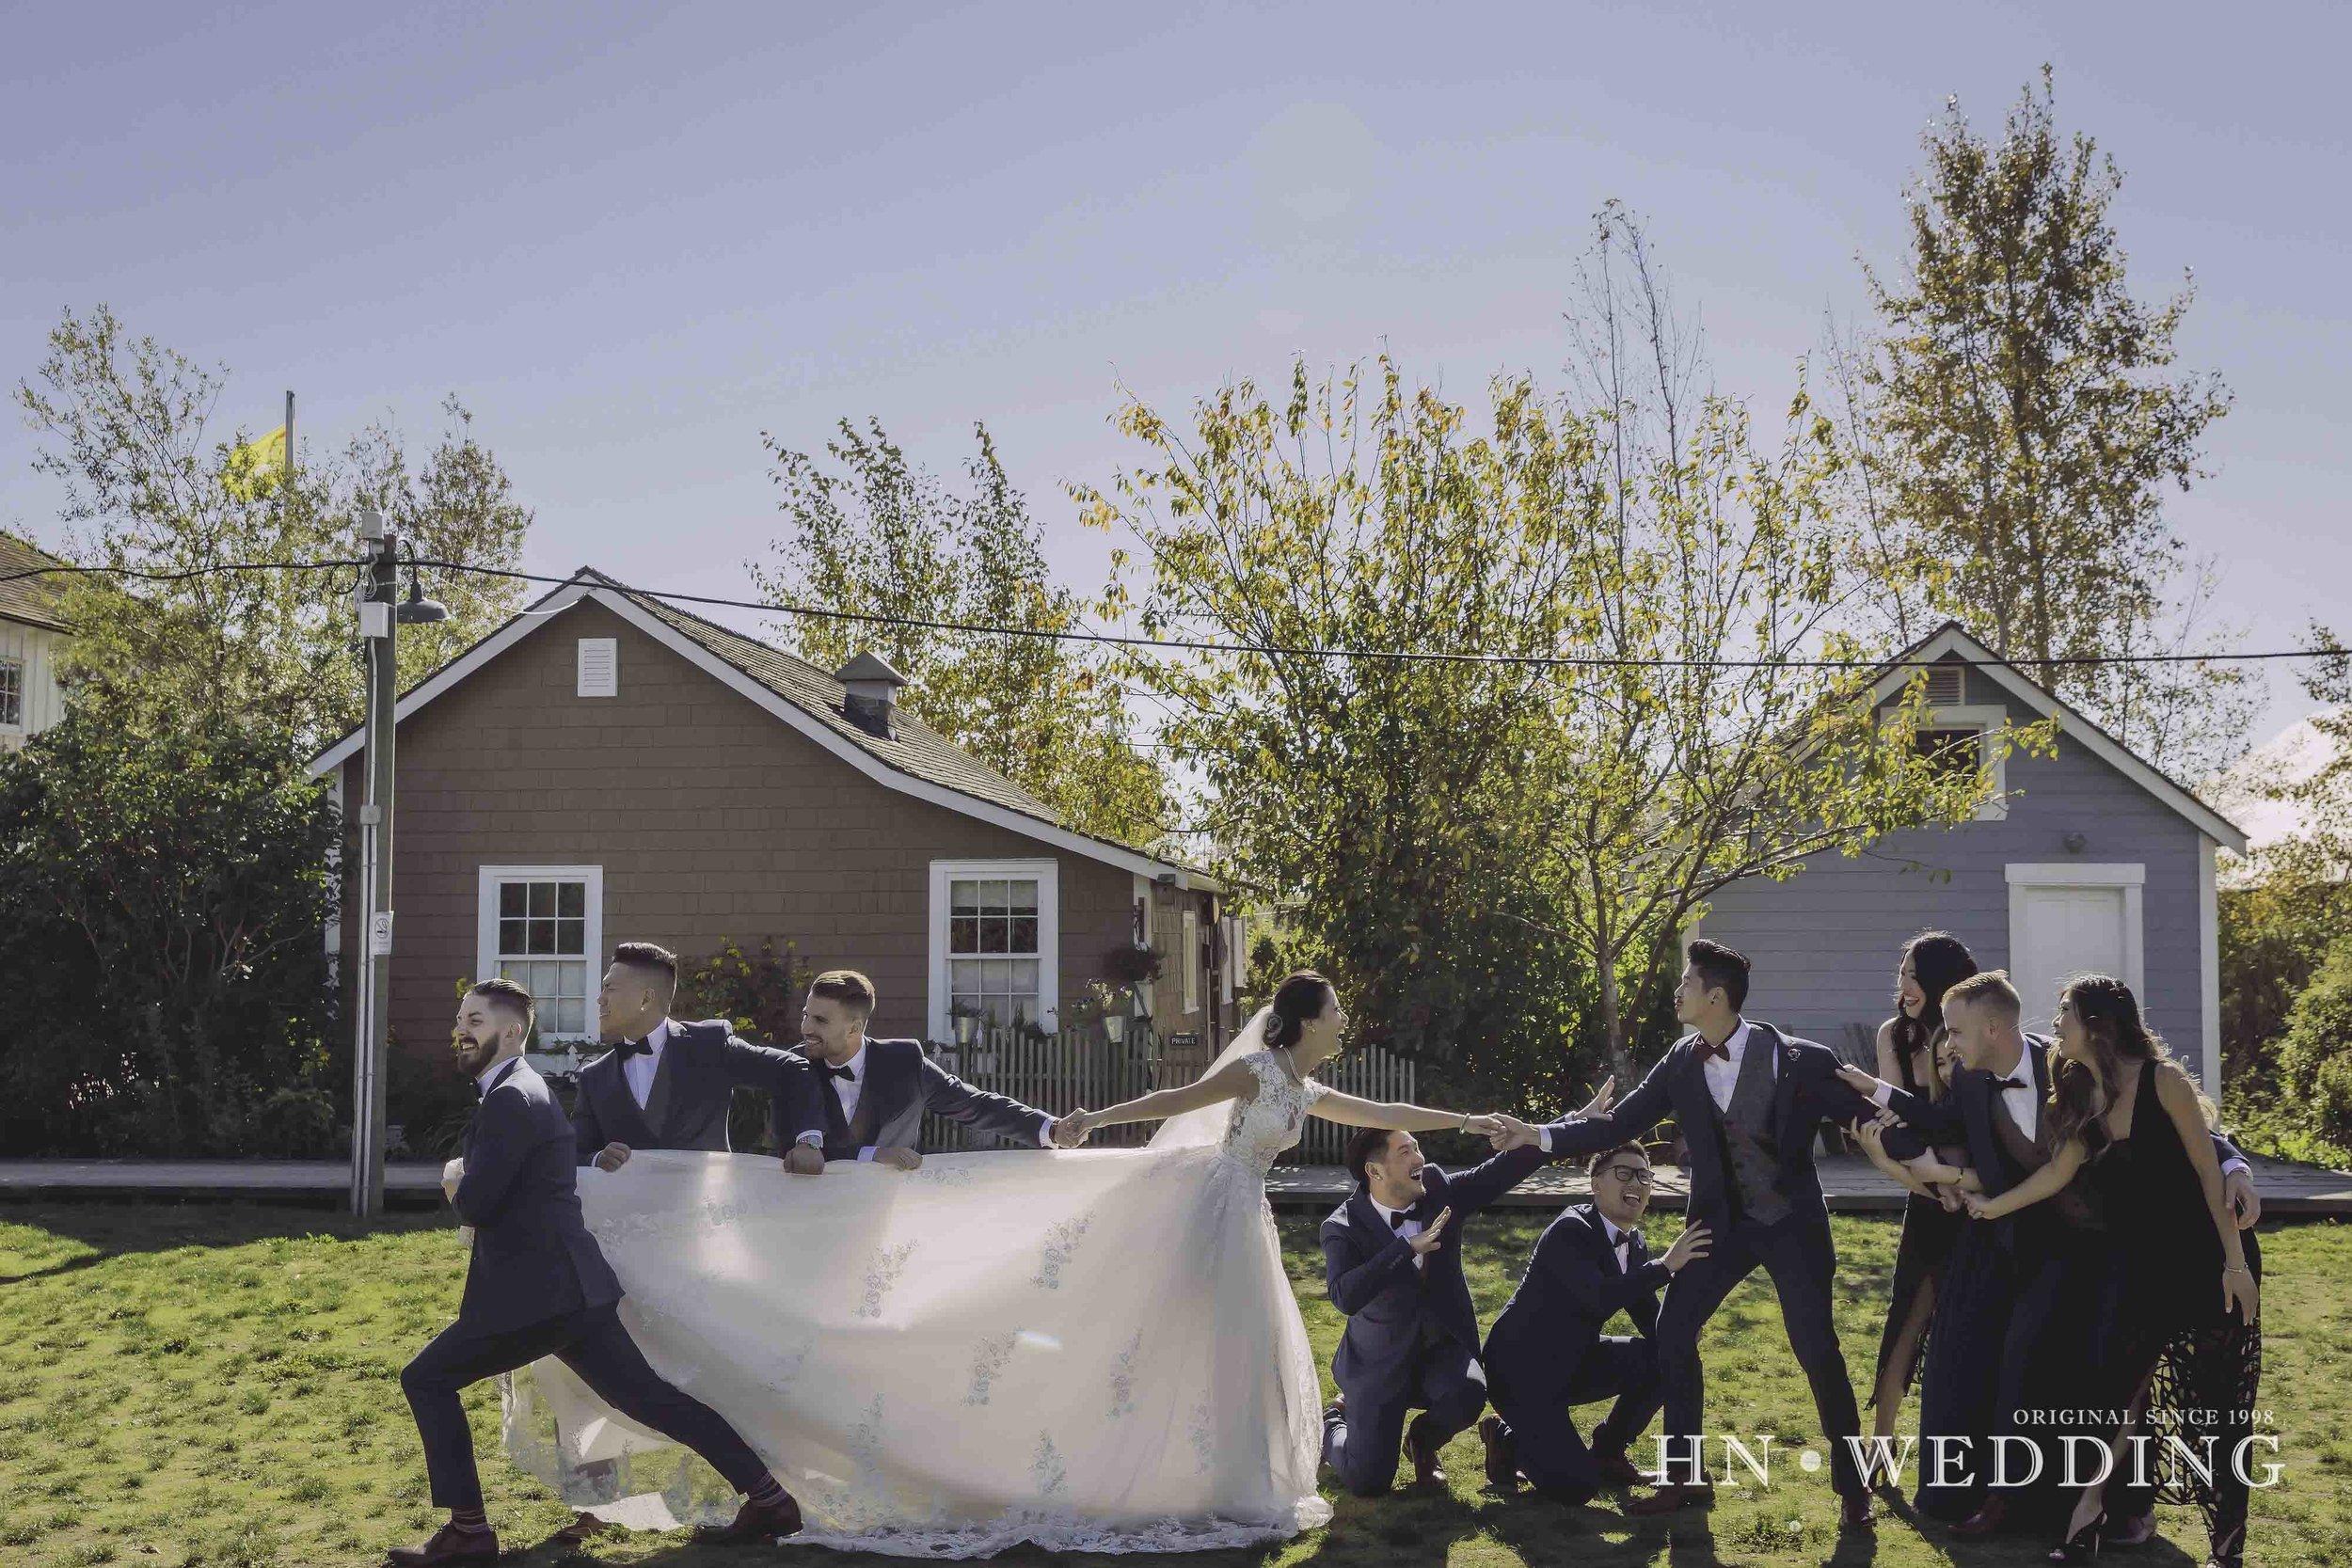 HNwedding-20160815-wedding-019-1.jpg